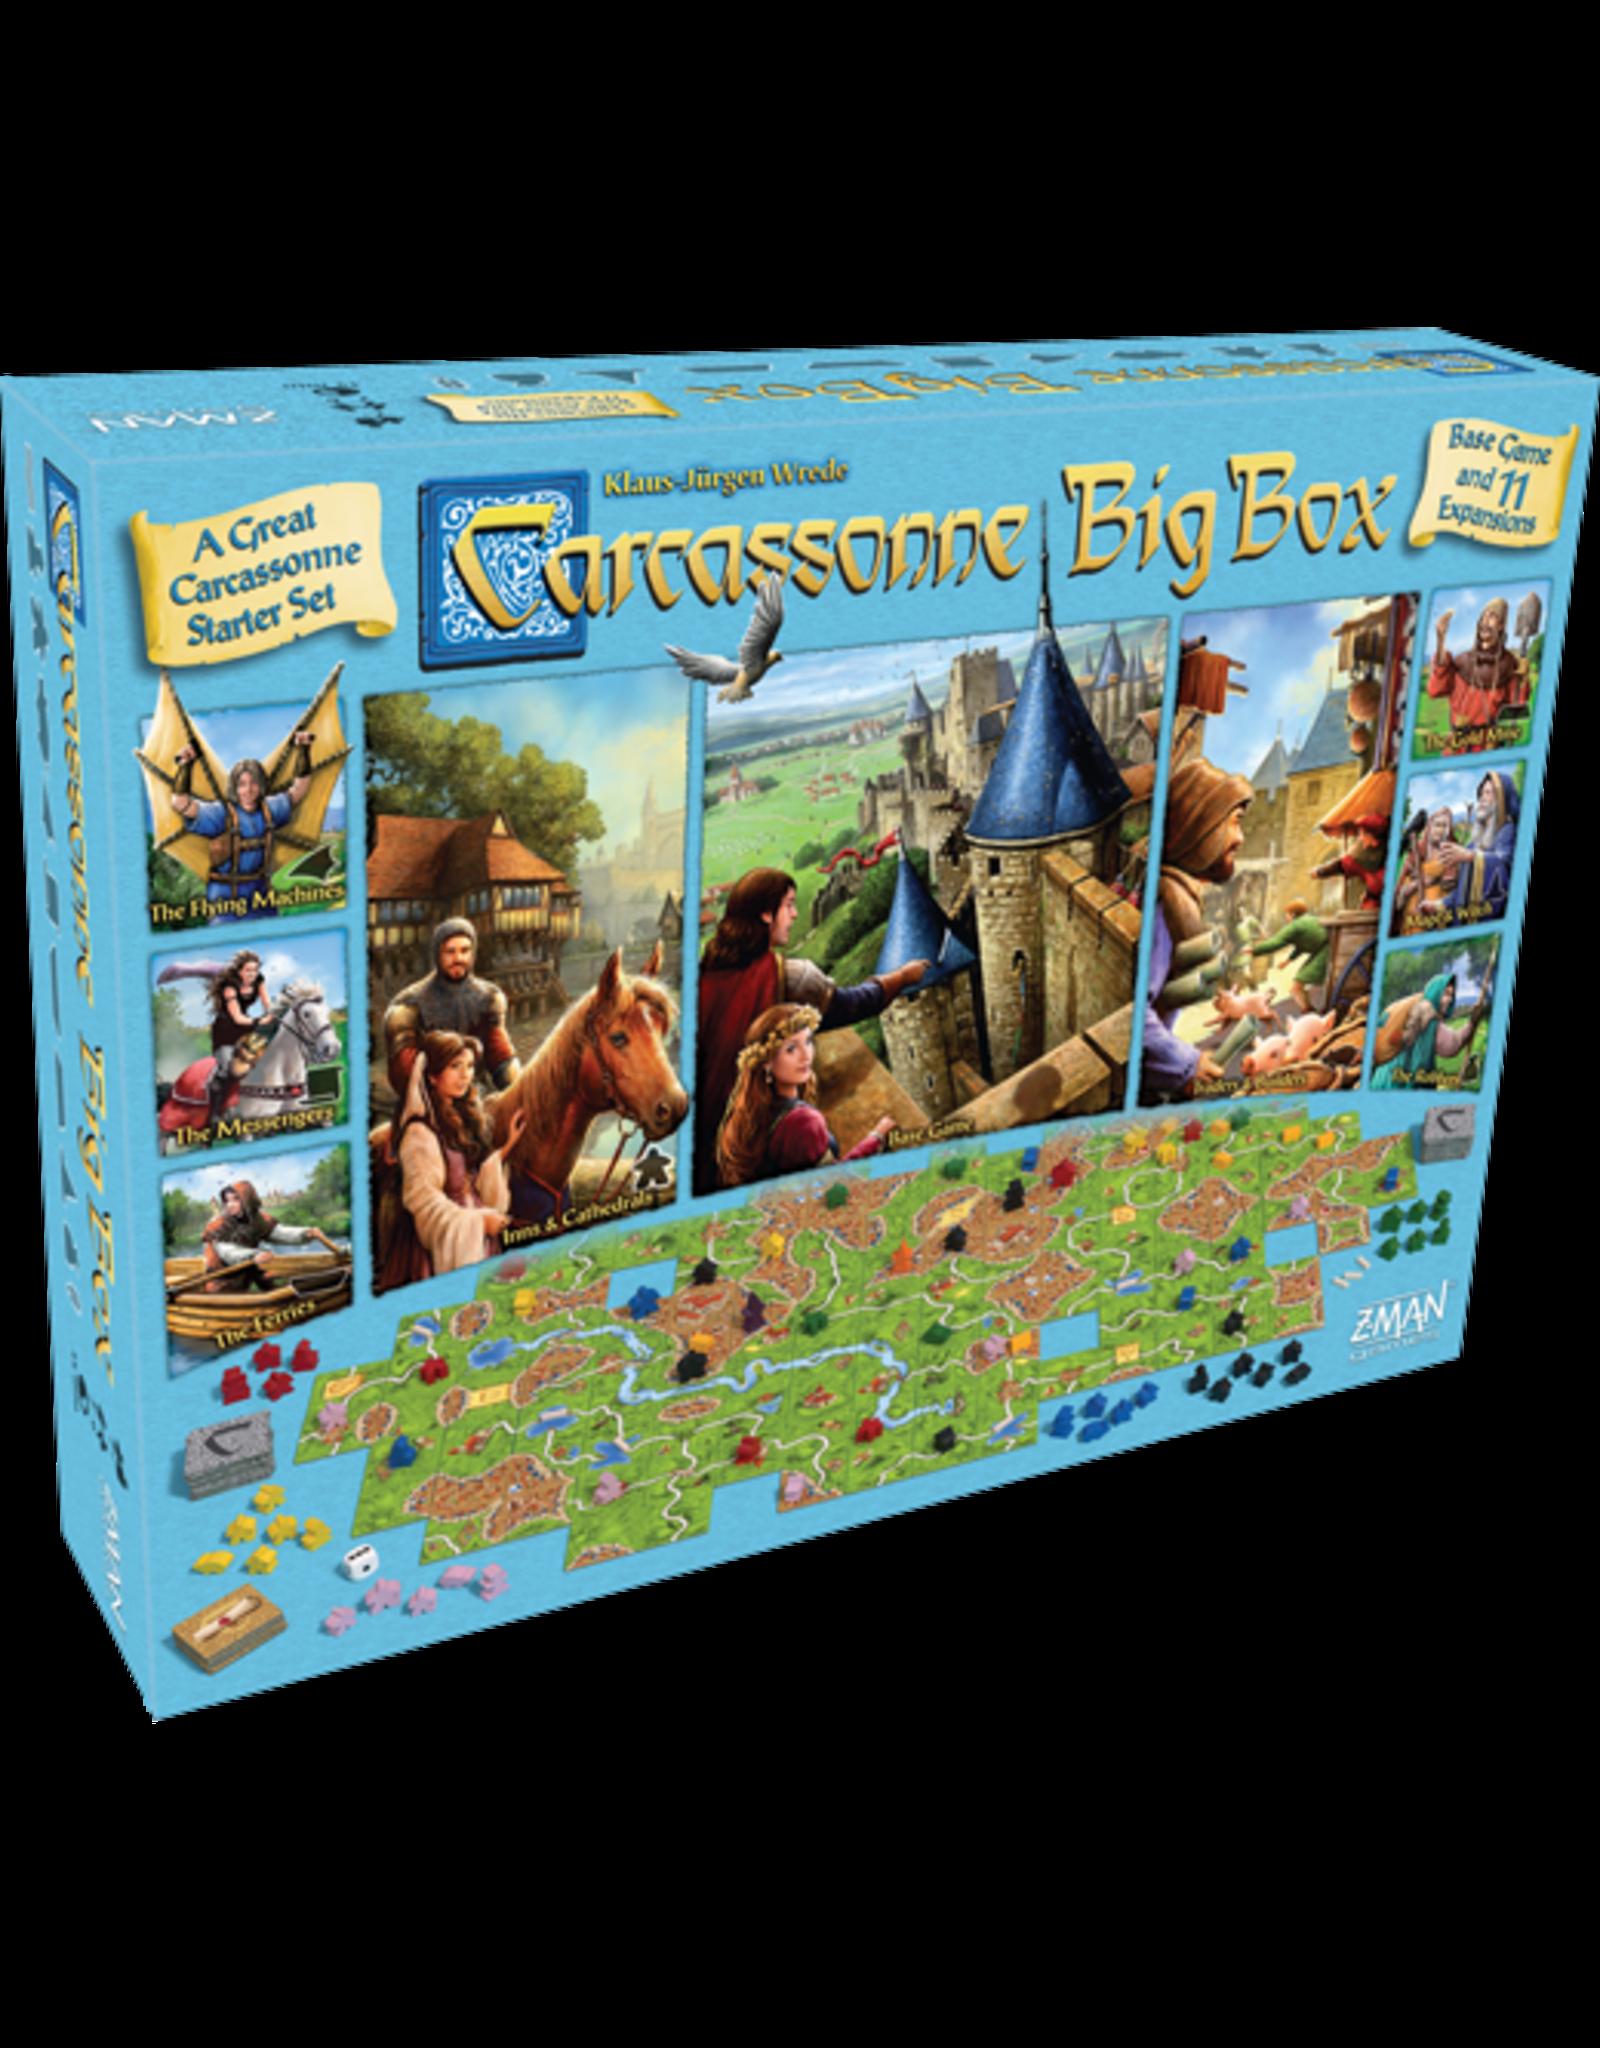 zman games Carcassonne Big Box